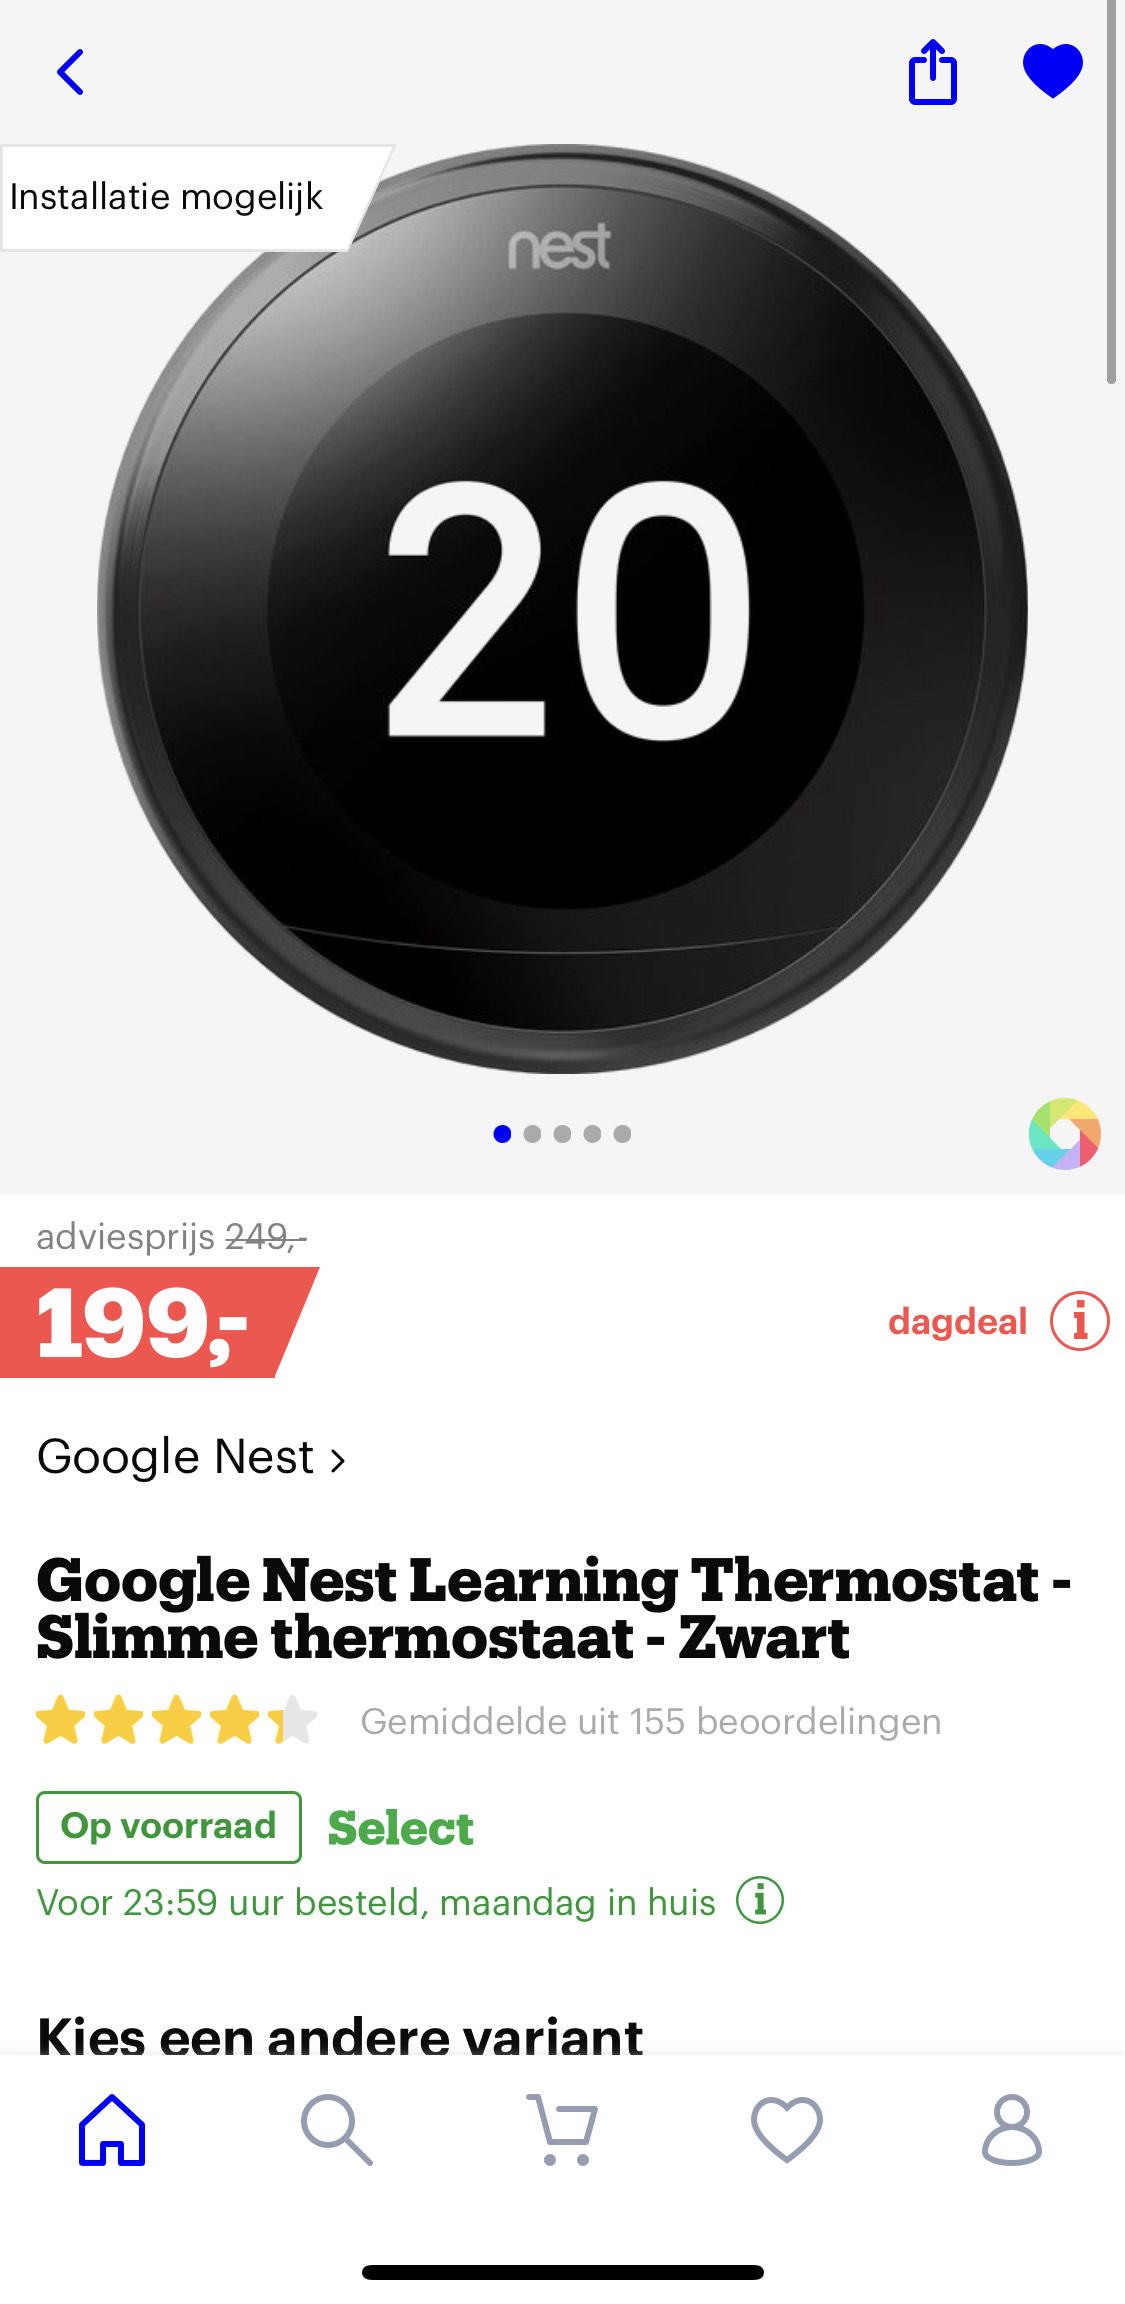 Google Nest Learning Thermostat (3e genaratie)